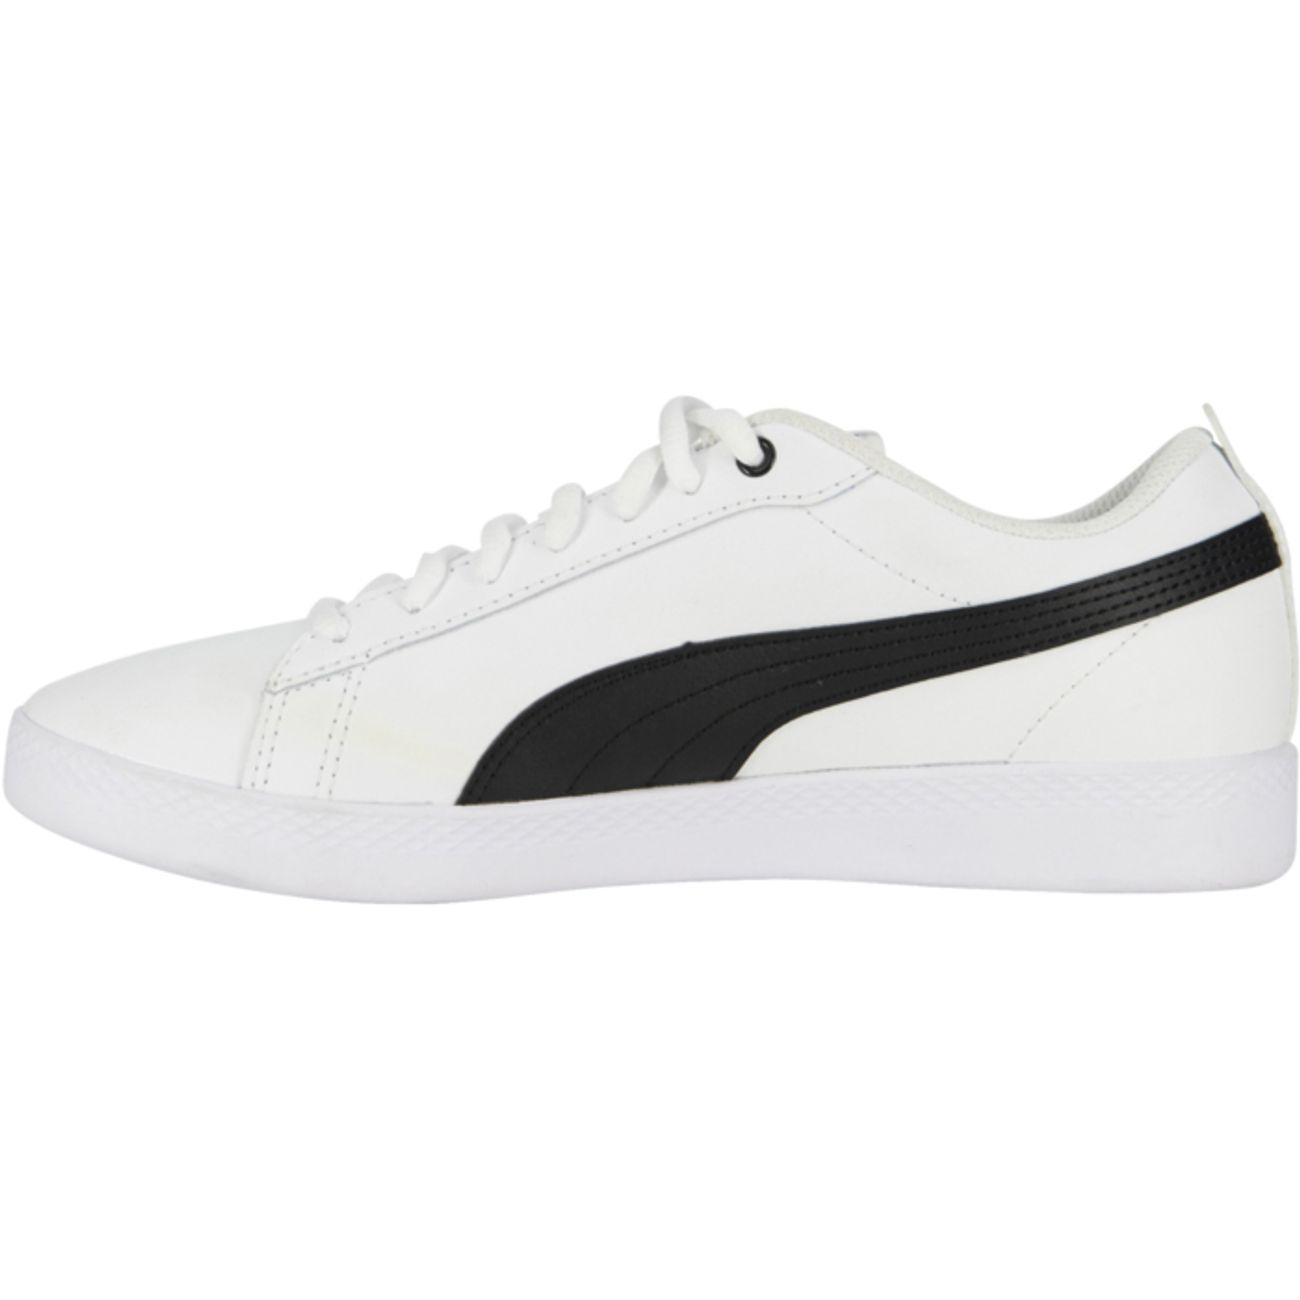 Smash Femme Chaussures Puma L Wns V2 Basses qSUpMVz